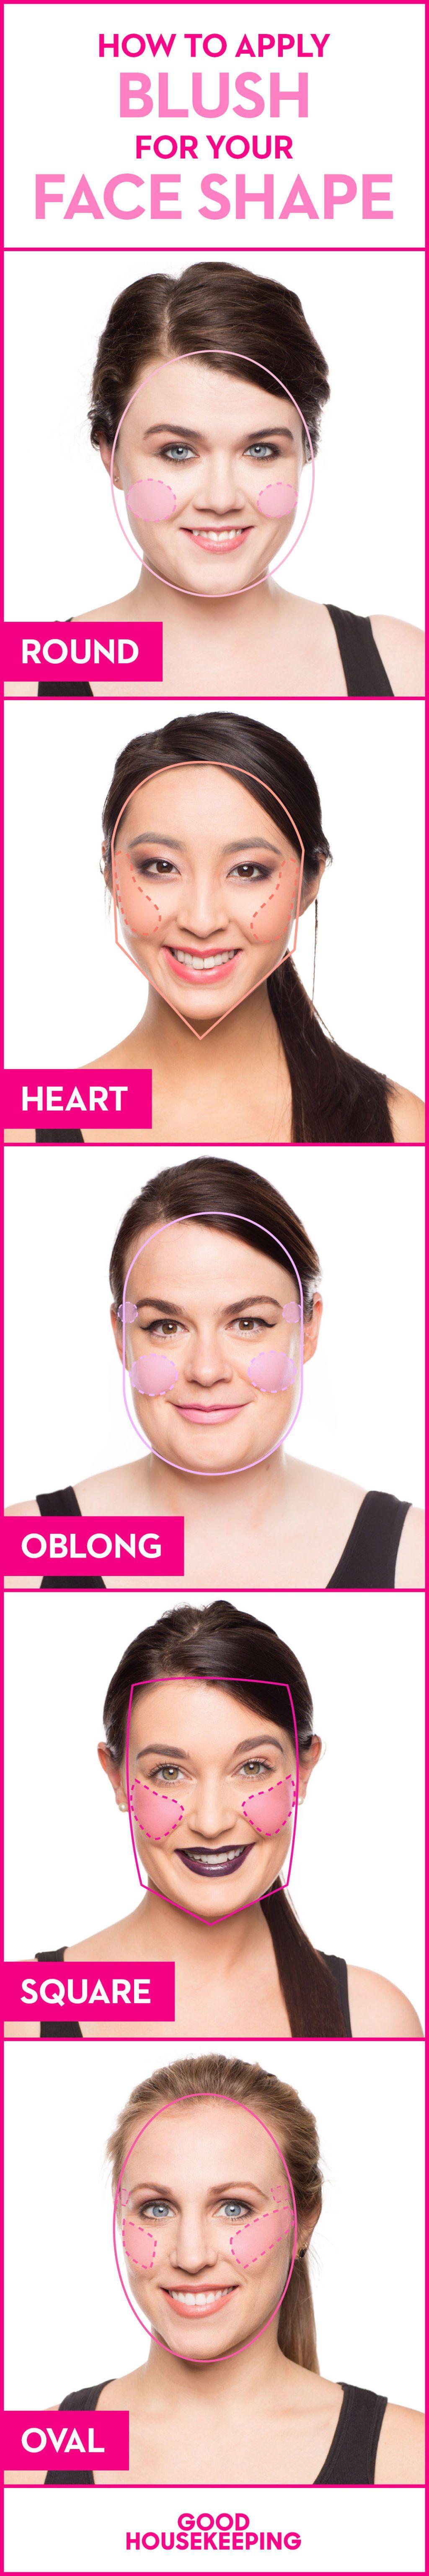 Photo heart shape face makeup tips